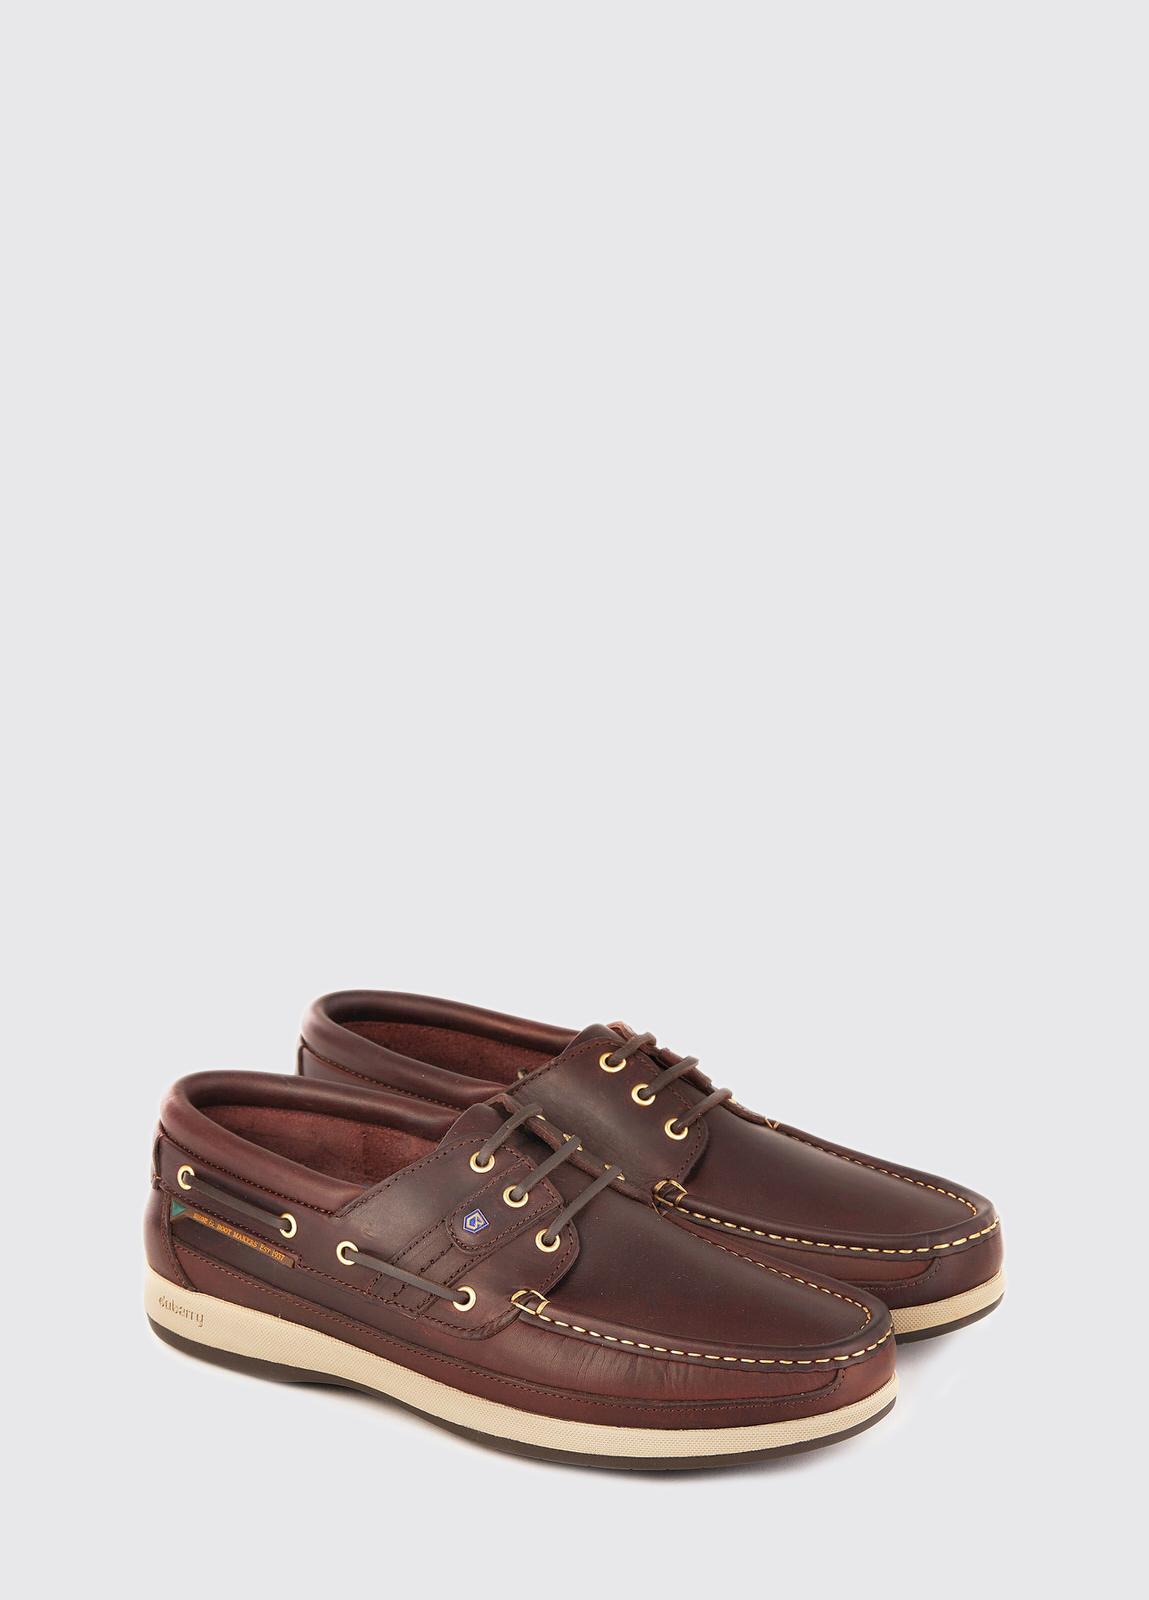 Atlantic Deck Shoe - Old Rum